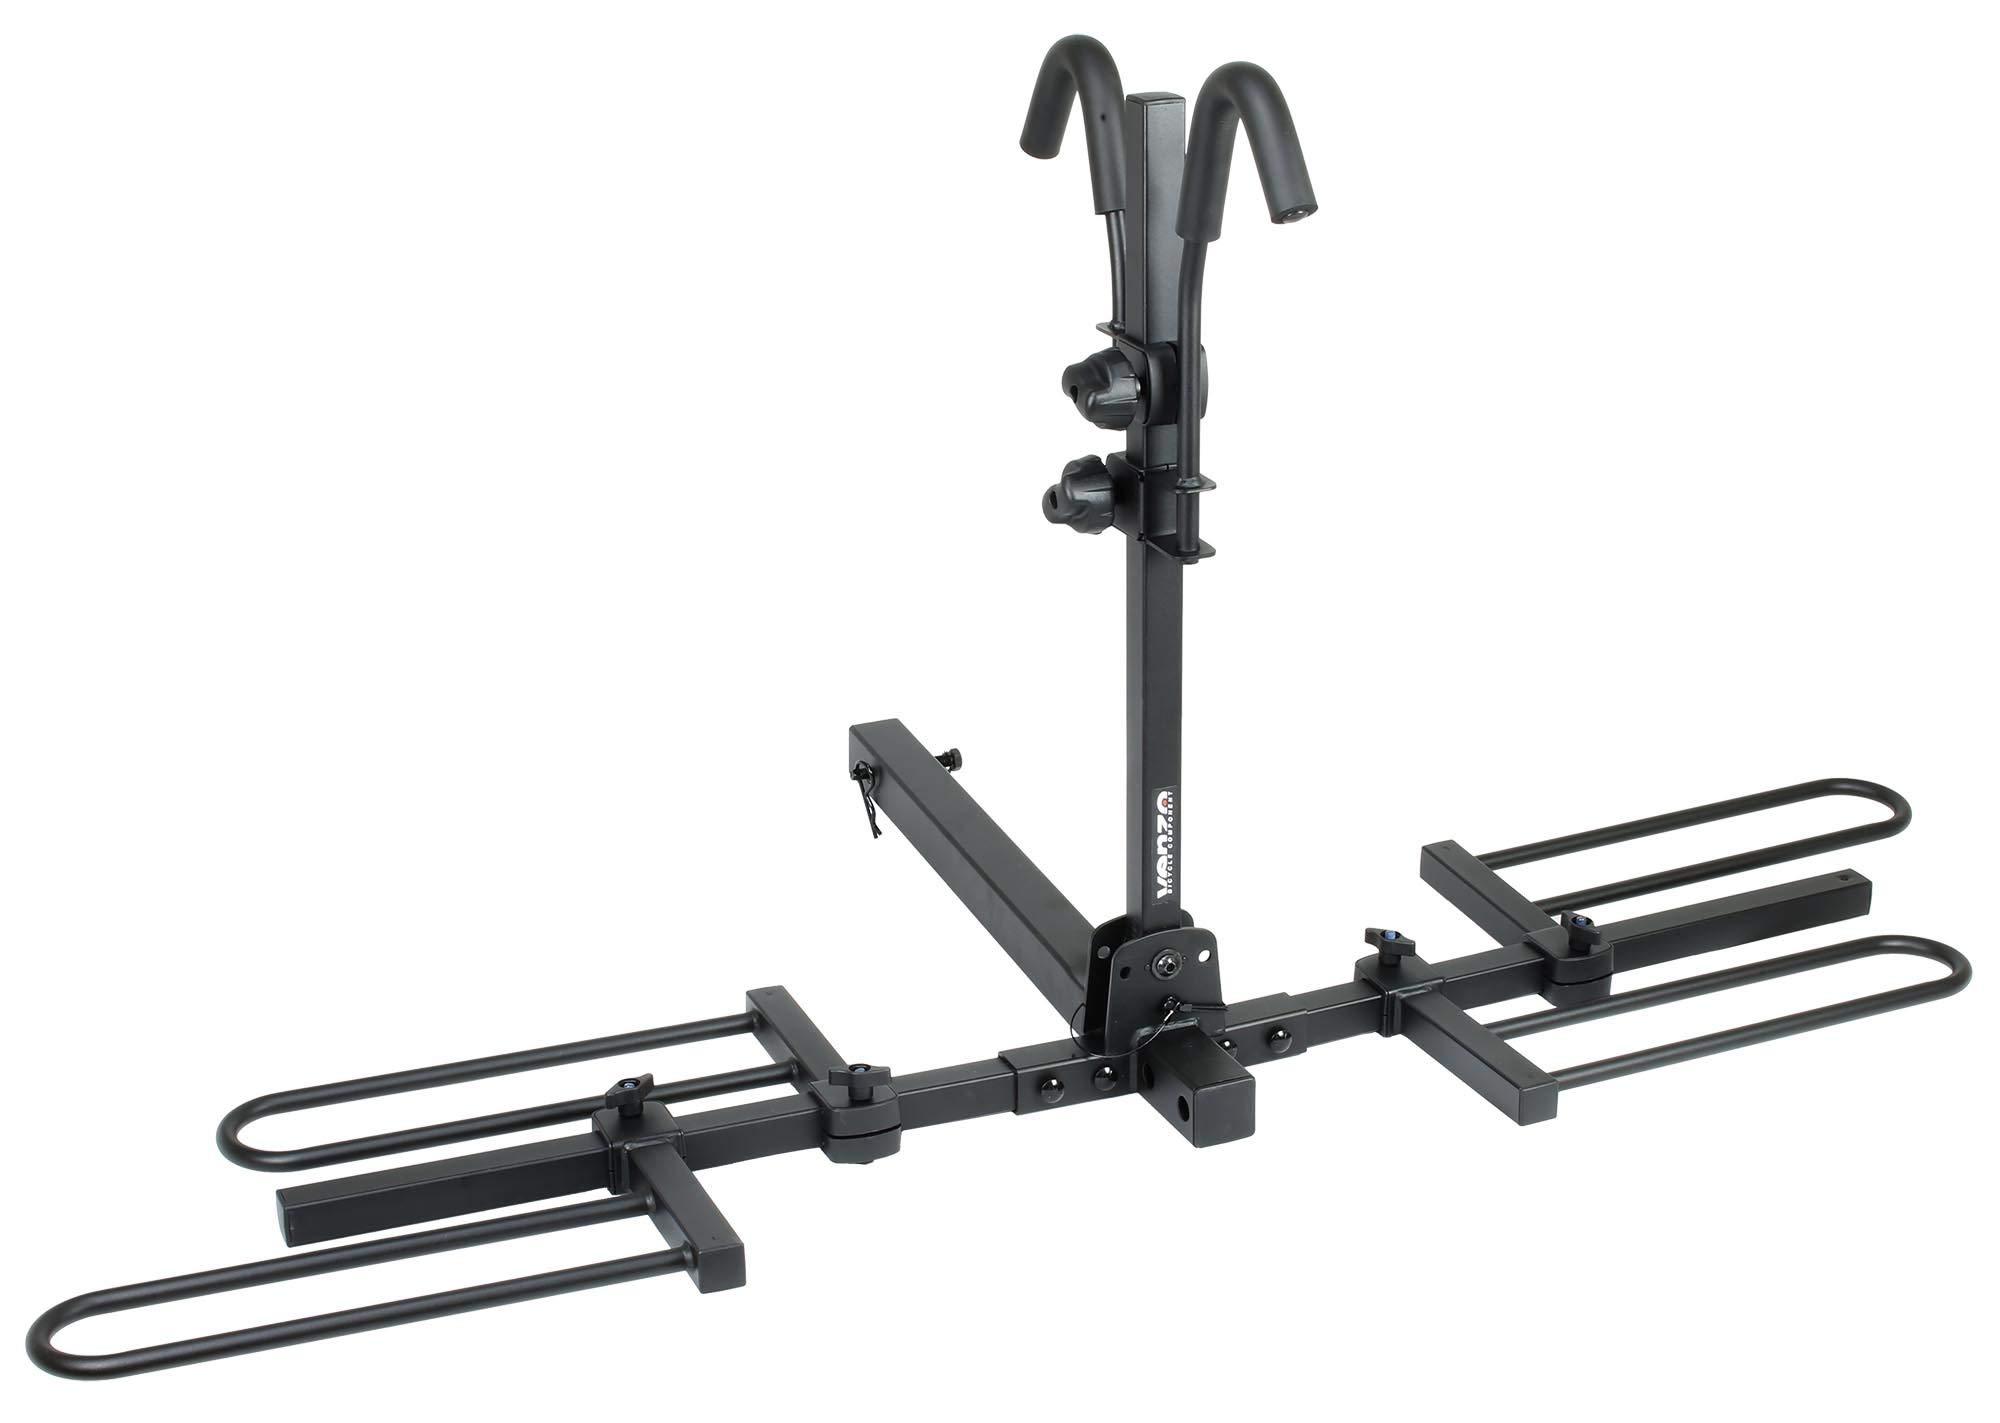 Venzo 2 4 Bike Bicycle Platform Style Carrier Bike Rack